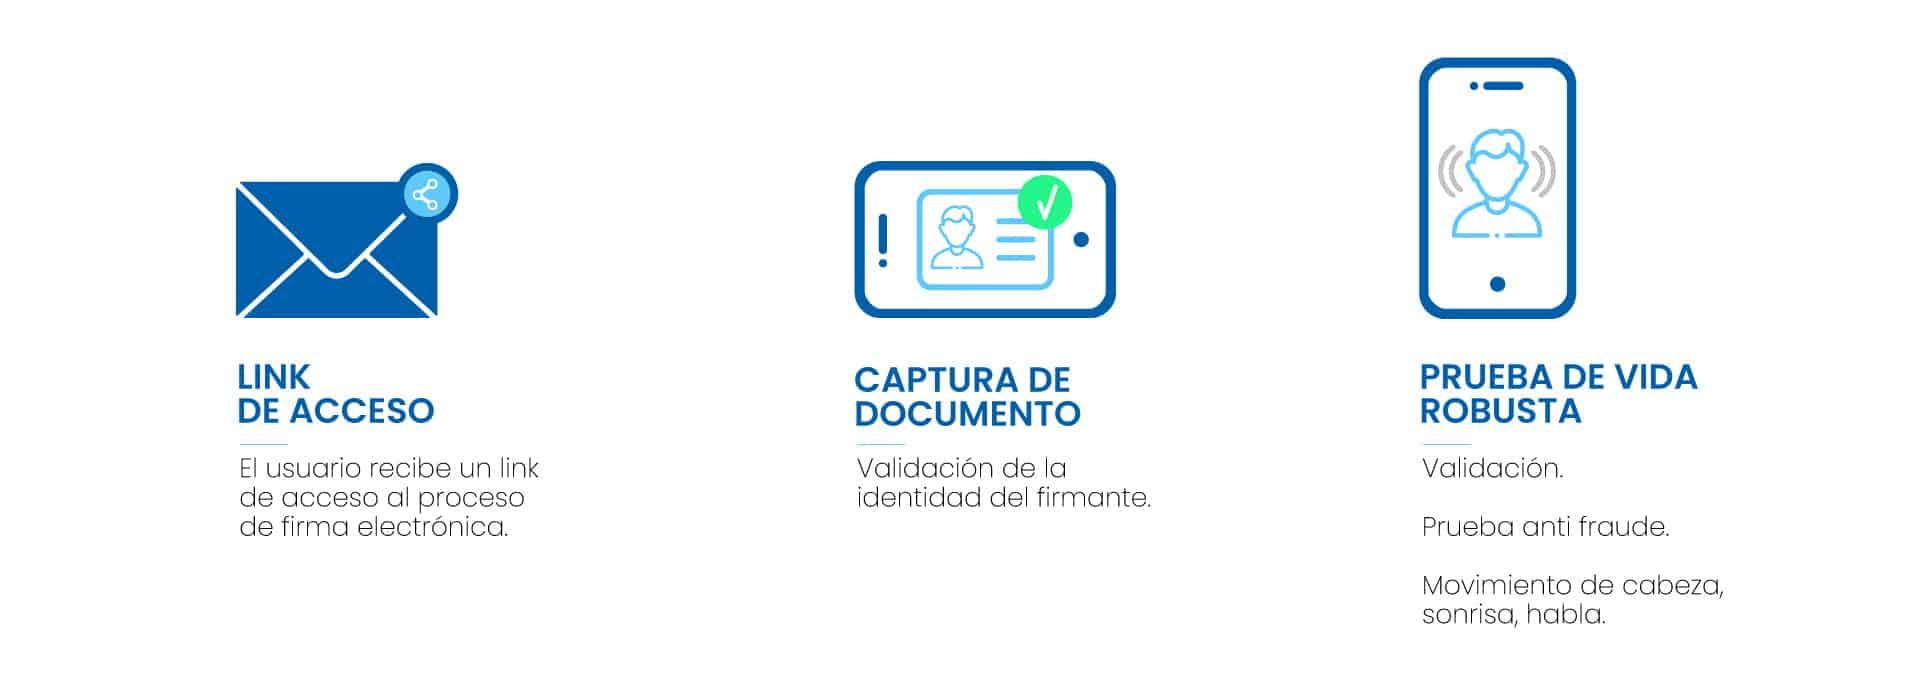 Proceso-firma-electronica-avanzada-nuevo